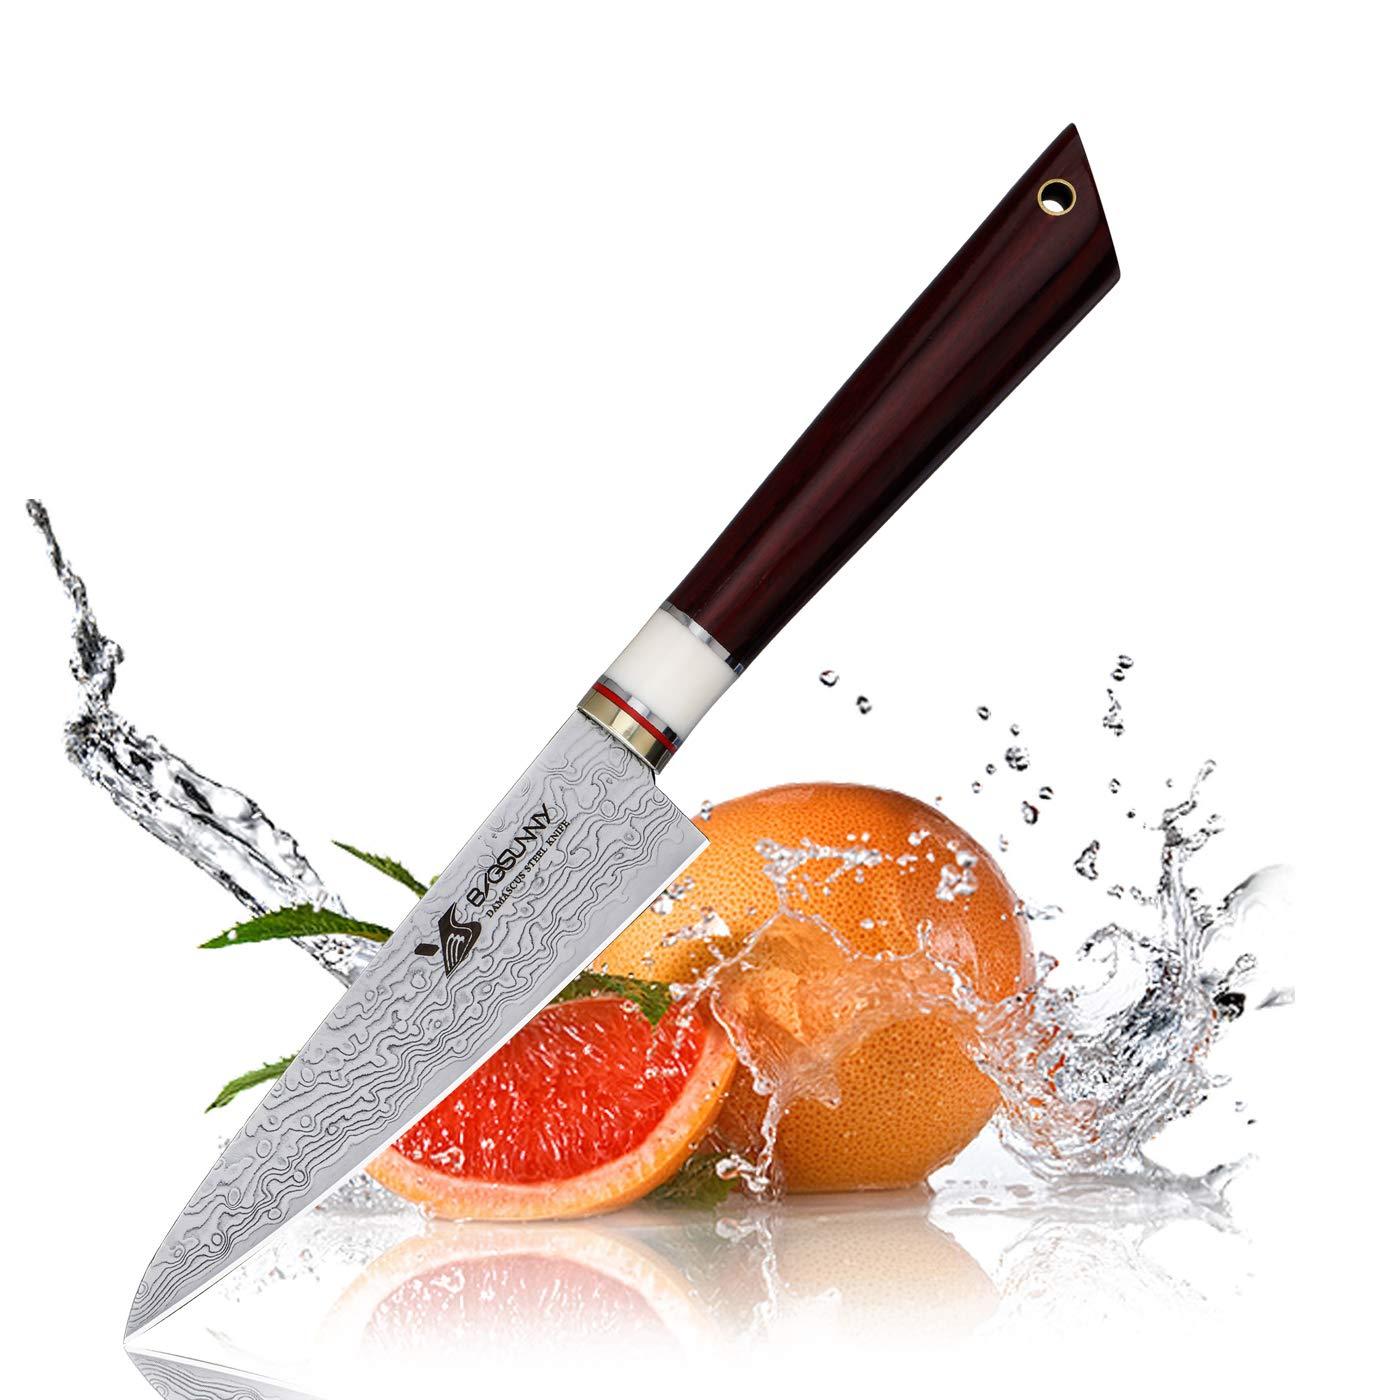 MSY BIGSUNNY 3.9'' Fruit Knife - Damascus Kitchen Slicing Knife - Super Damascus Stainless Steel Cutting Core Blade - Raindrop Damascus Pattern - Big Leaf Sandalwood Handle